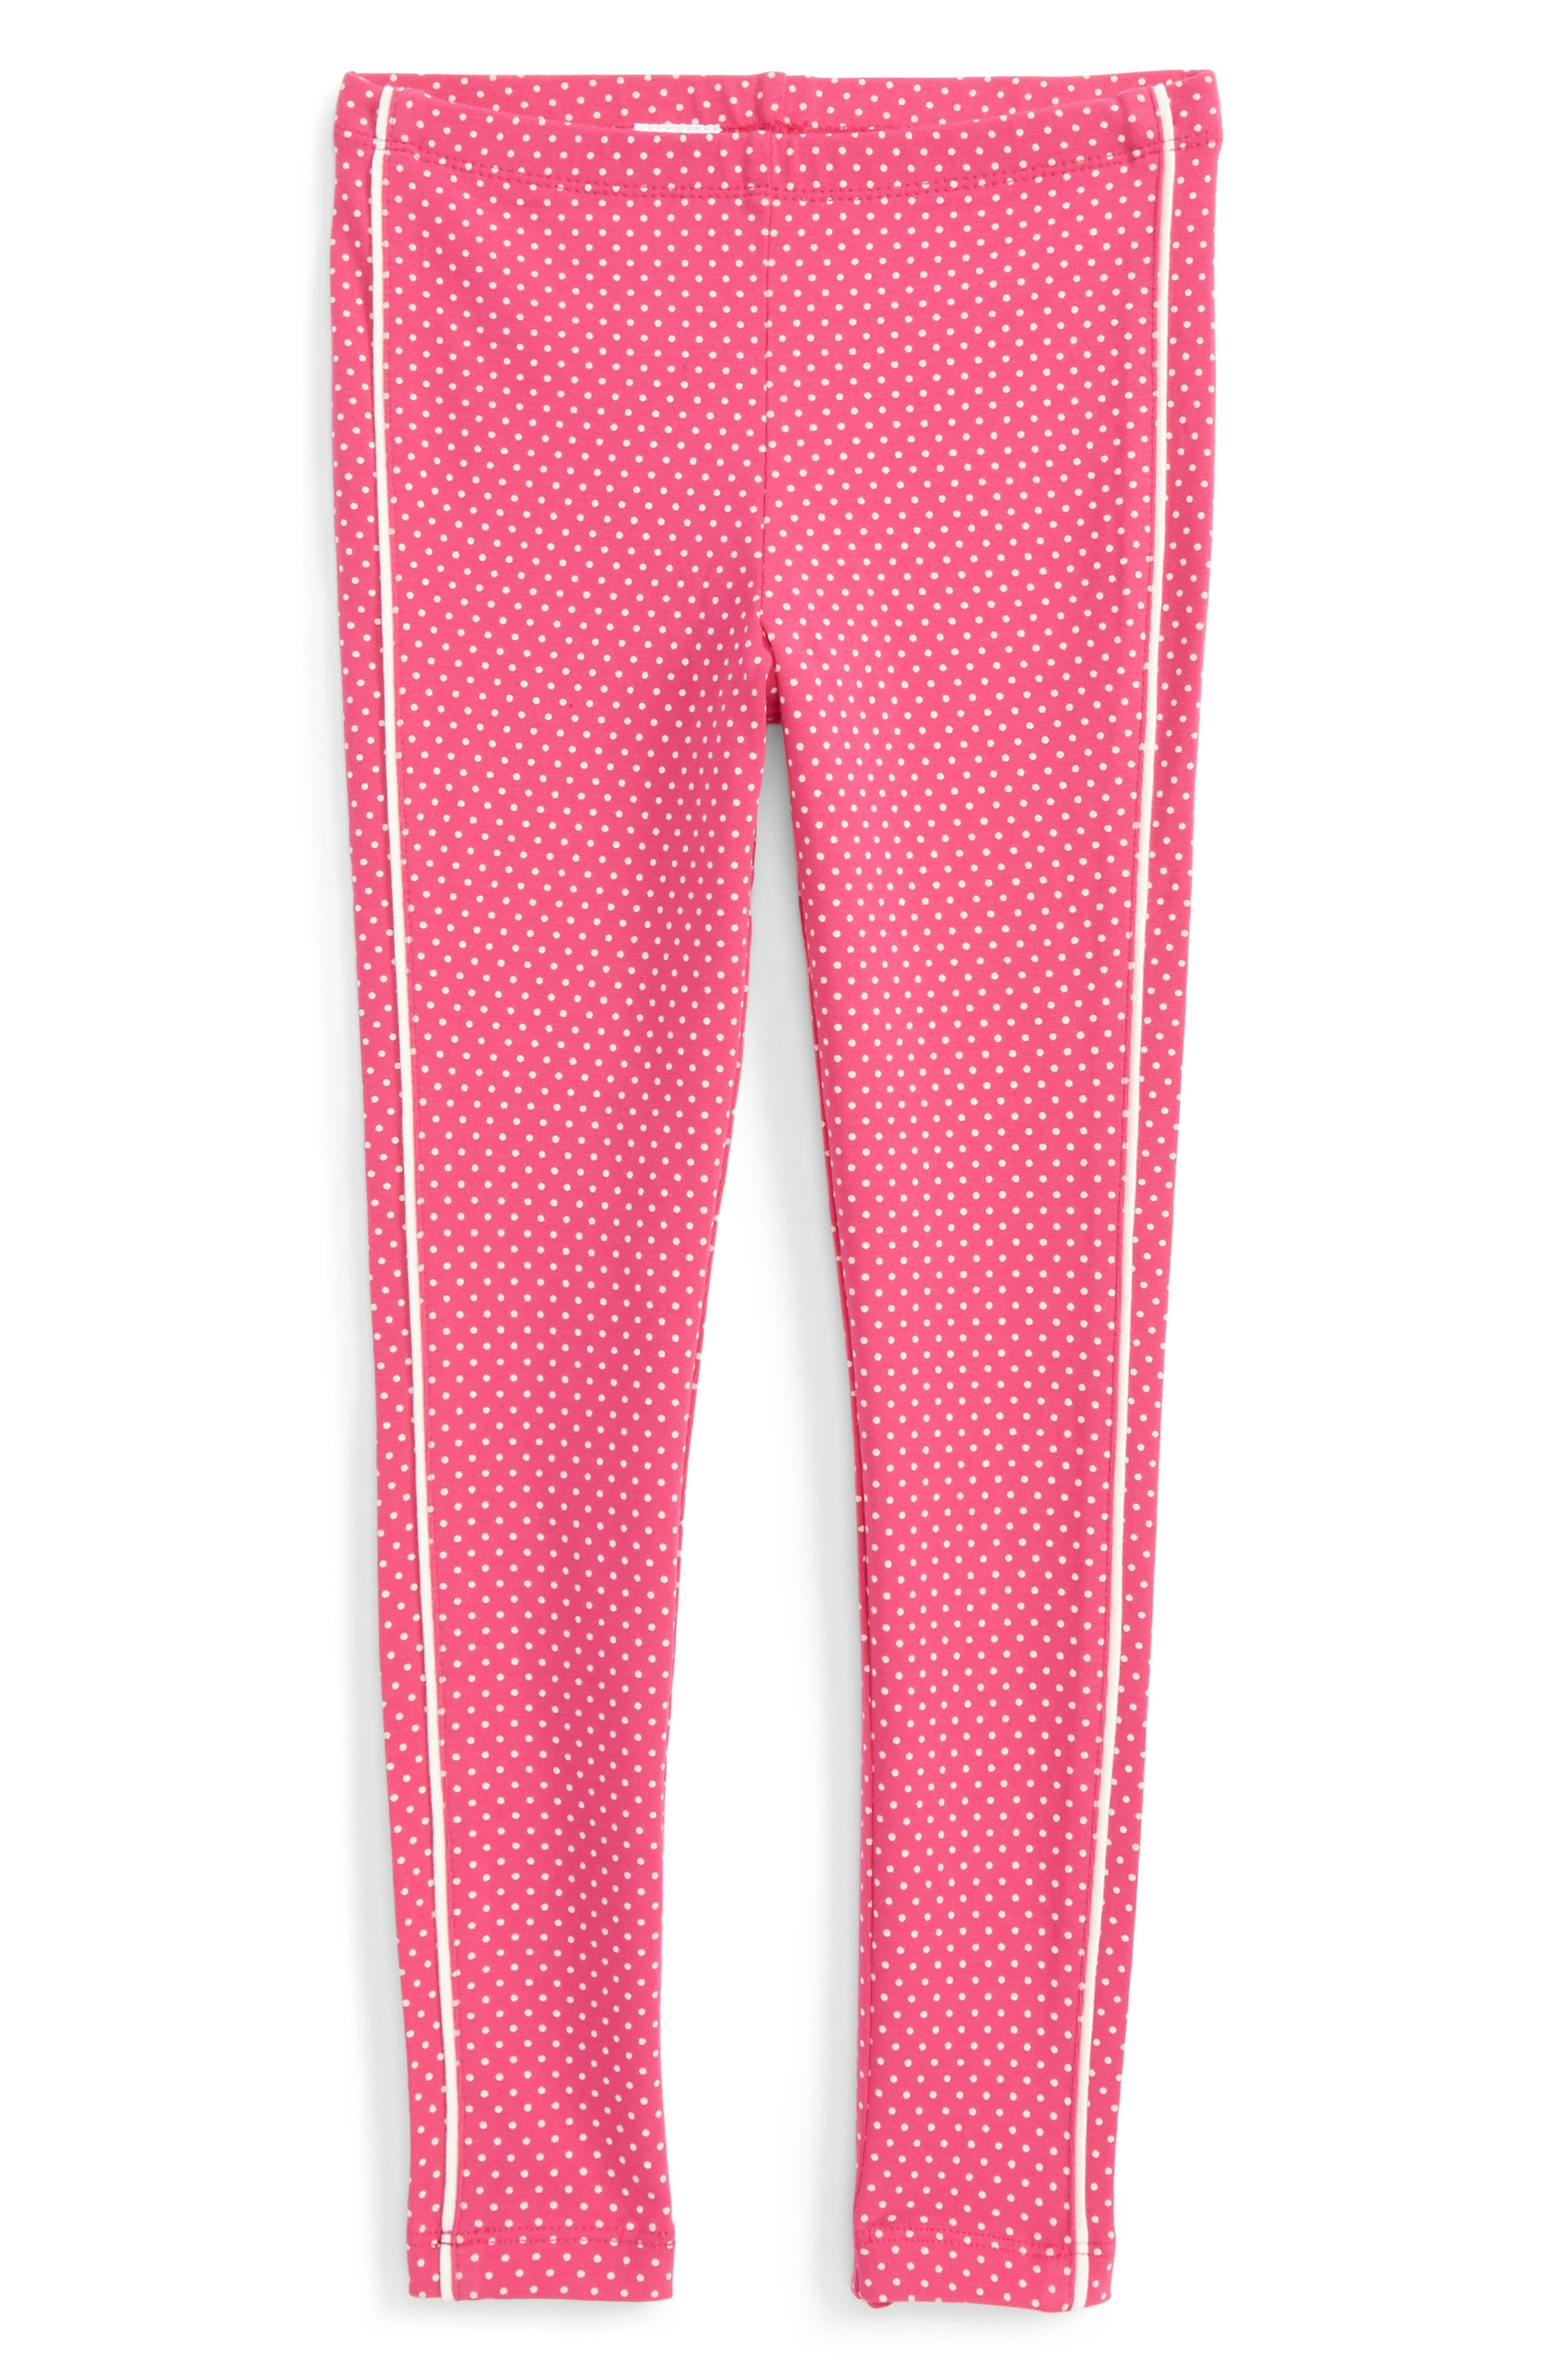 Stripe-n-Dot Leggings,                         Main,                         color, 651